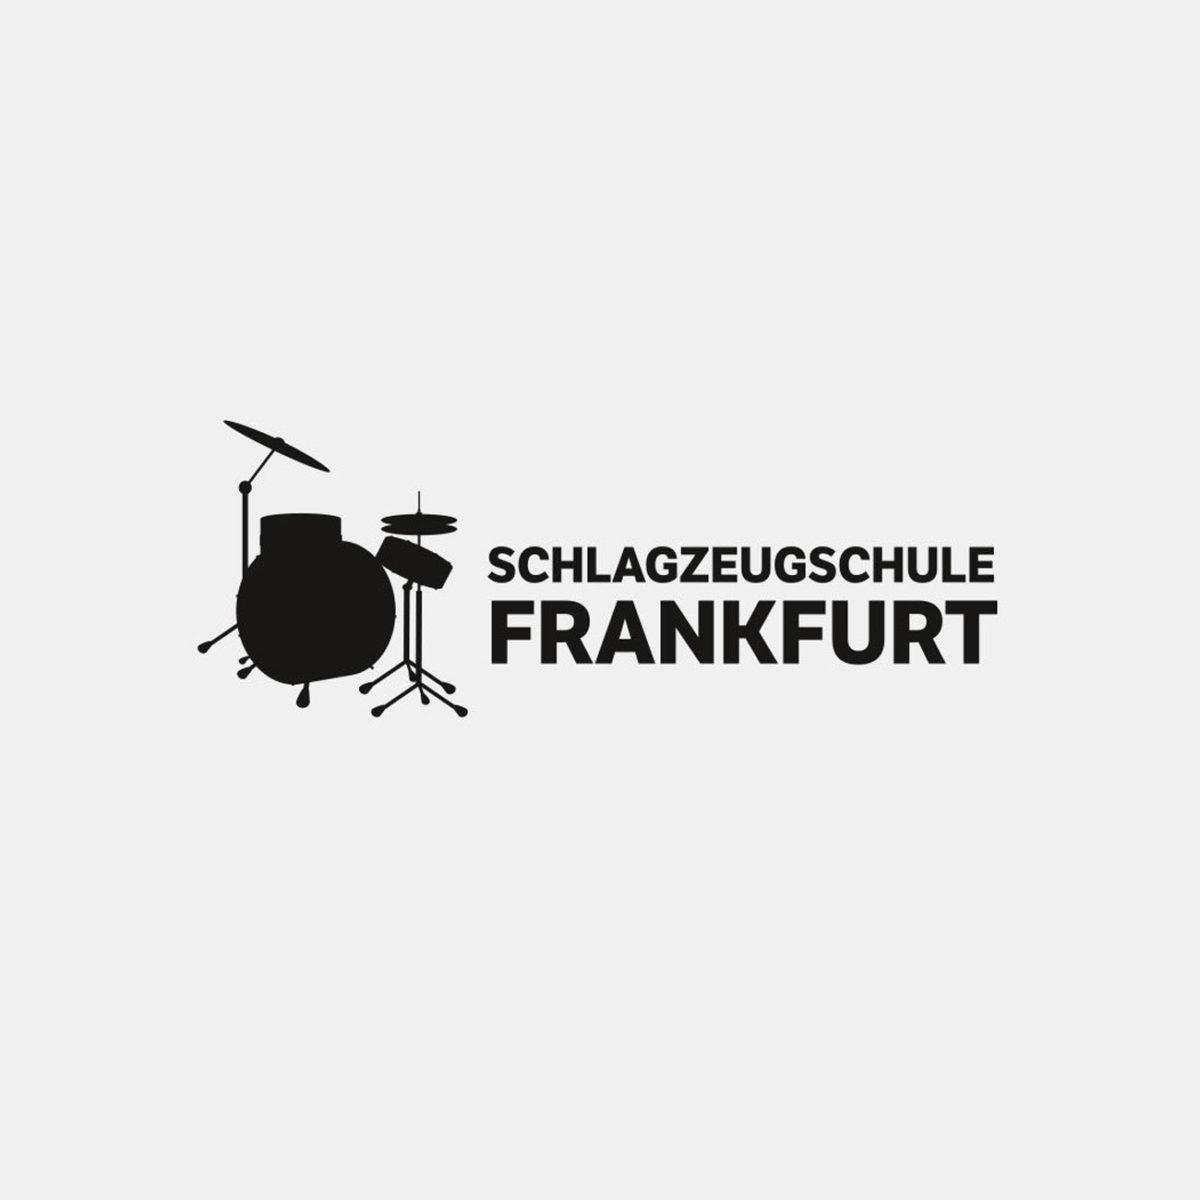 goldnbold_logodesign_schlagzeugschule_frankfurt